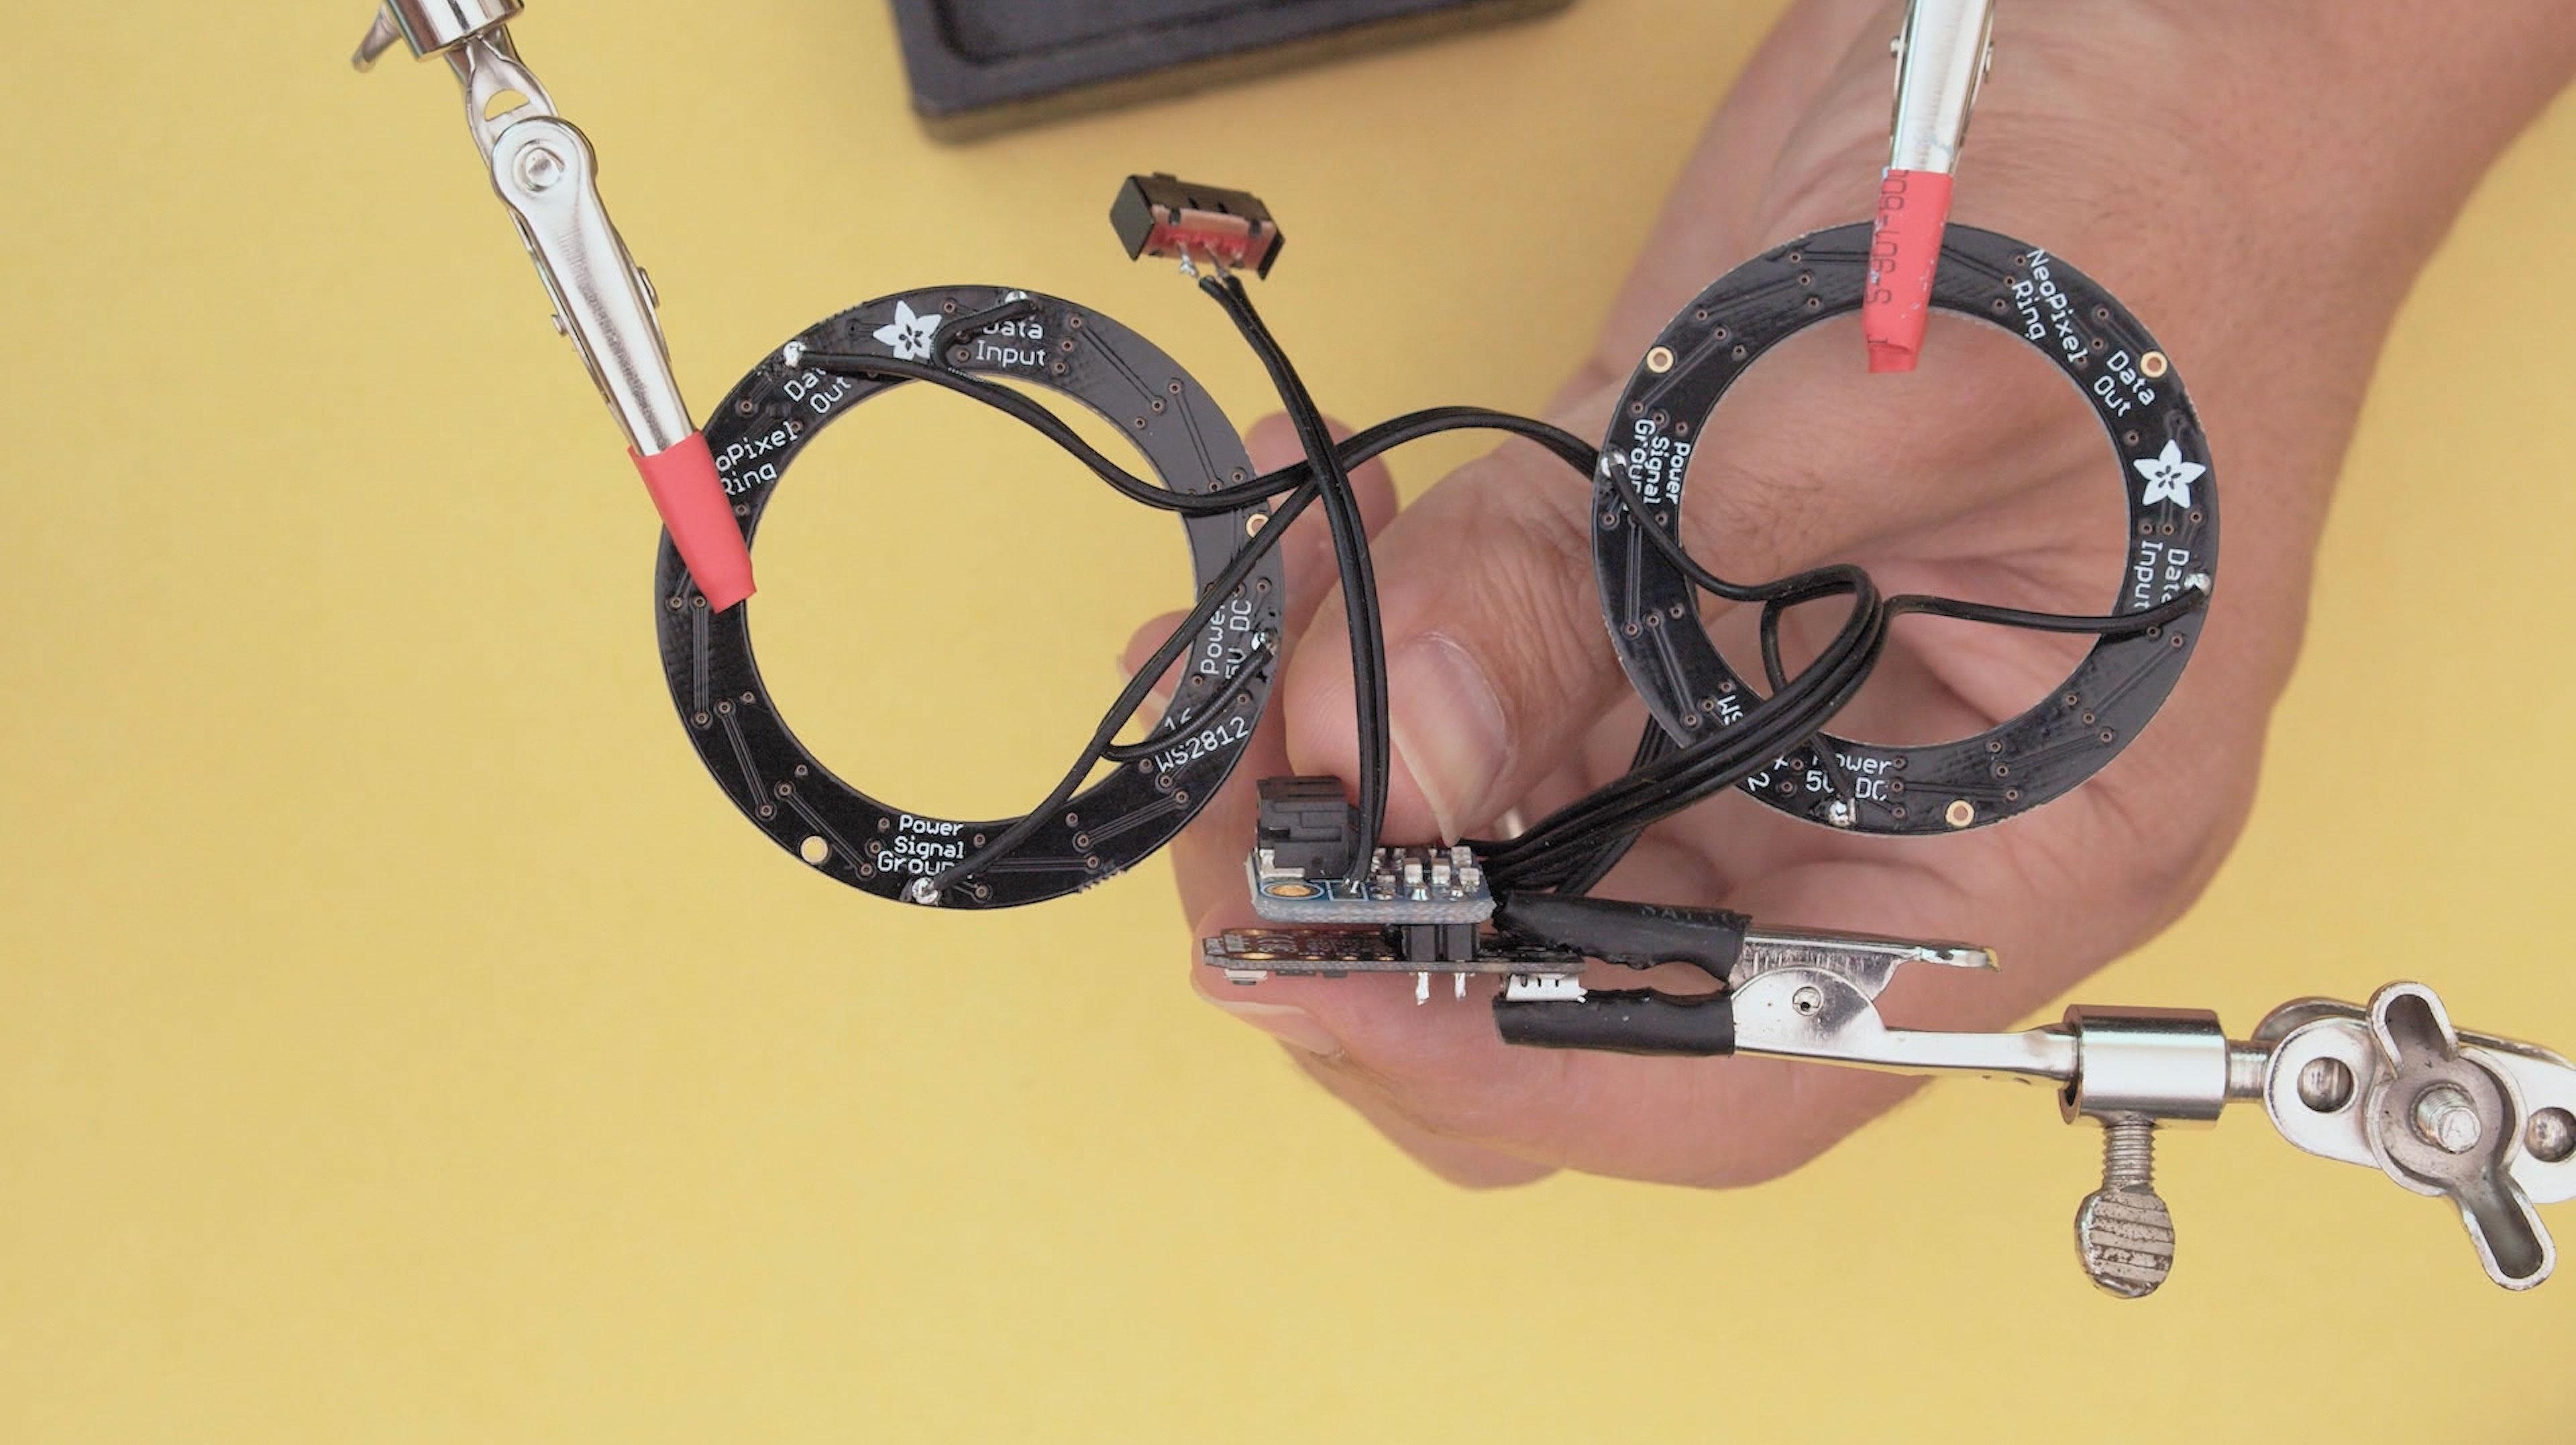 3d_printing_trinket-backpack-soldred.jpg